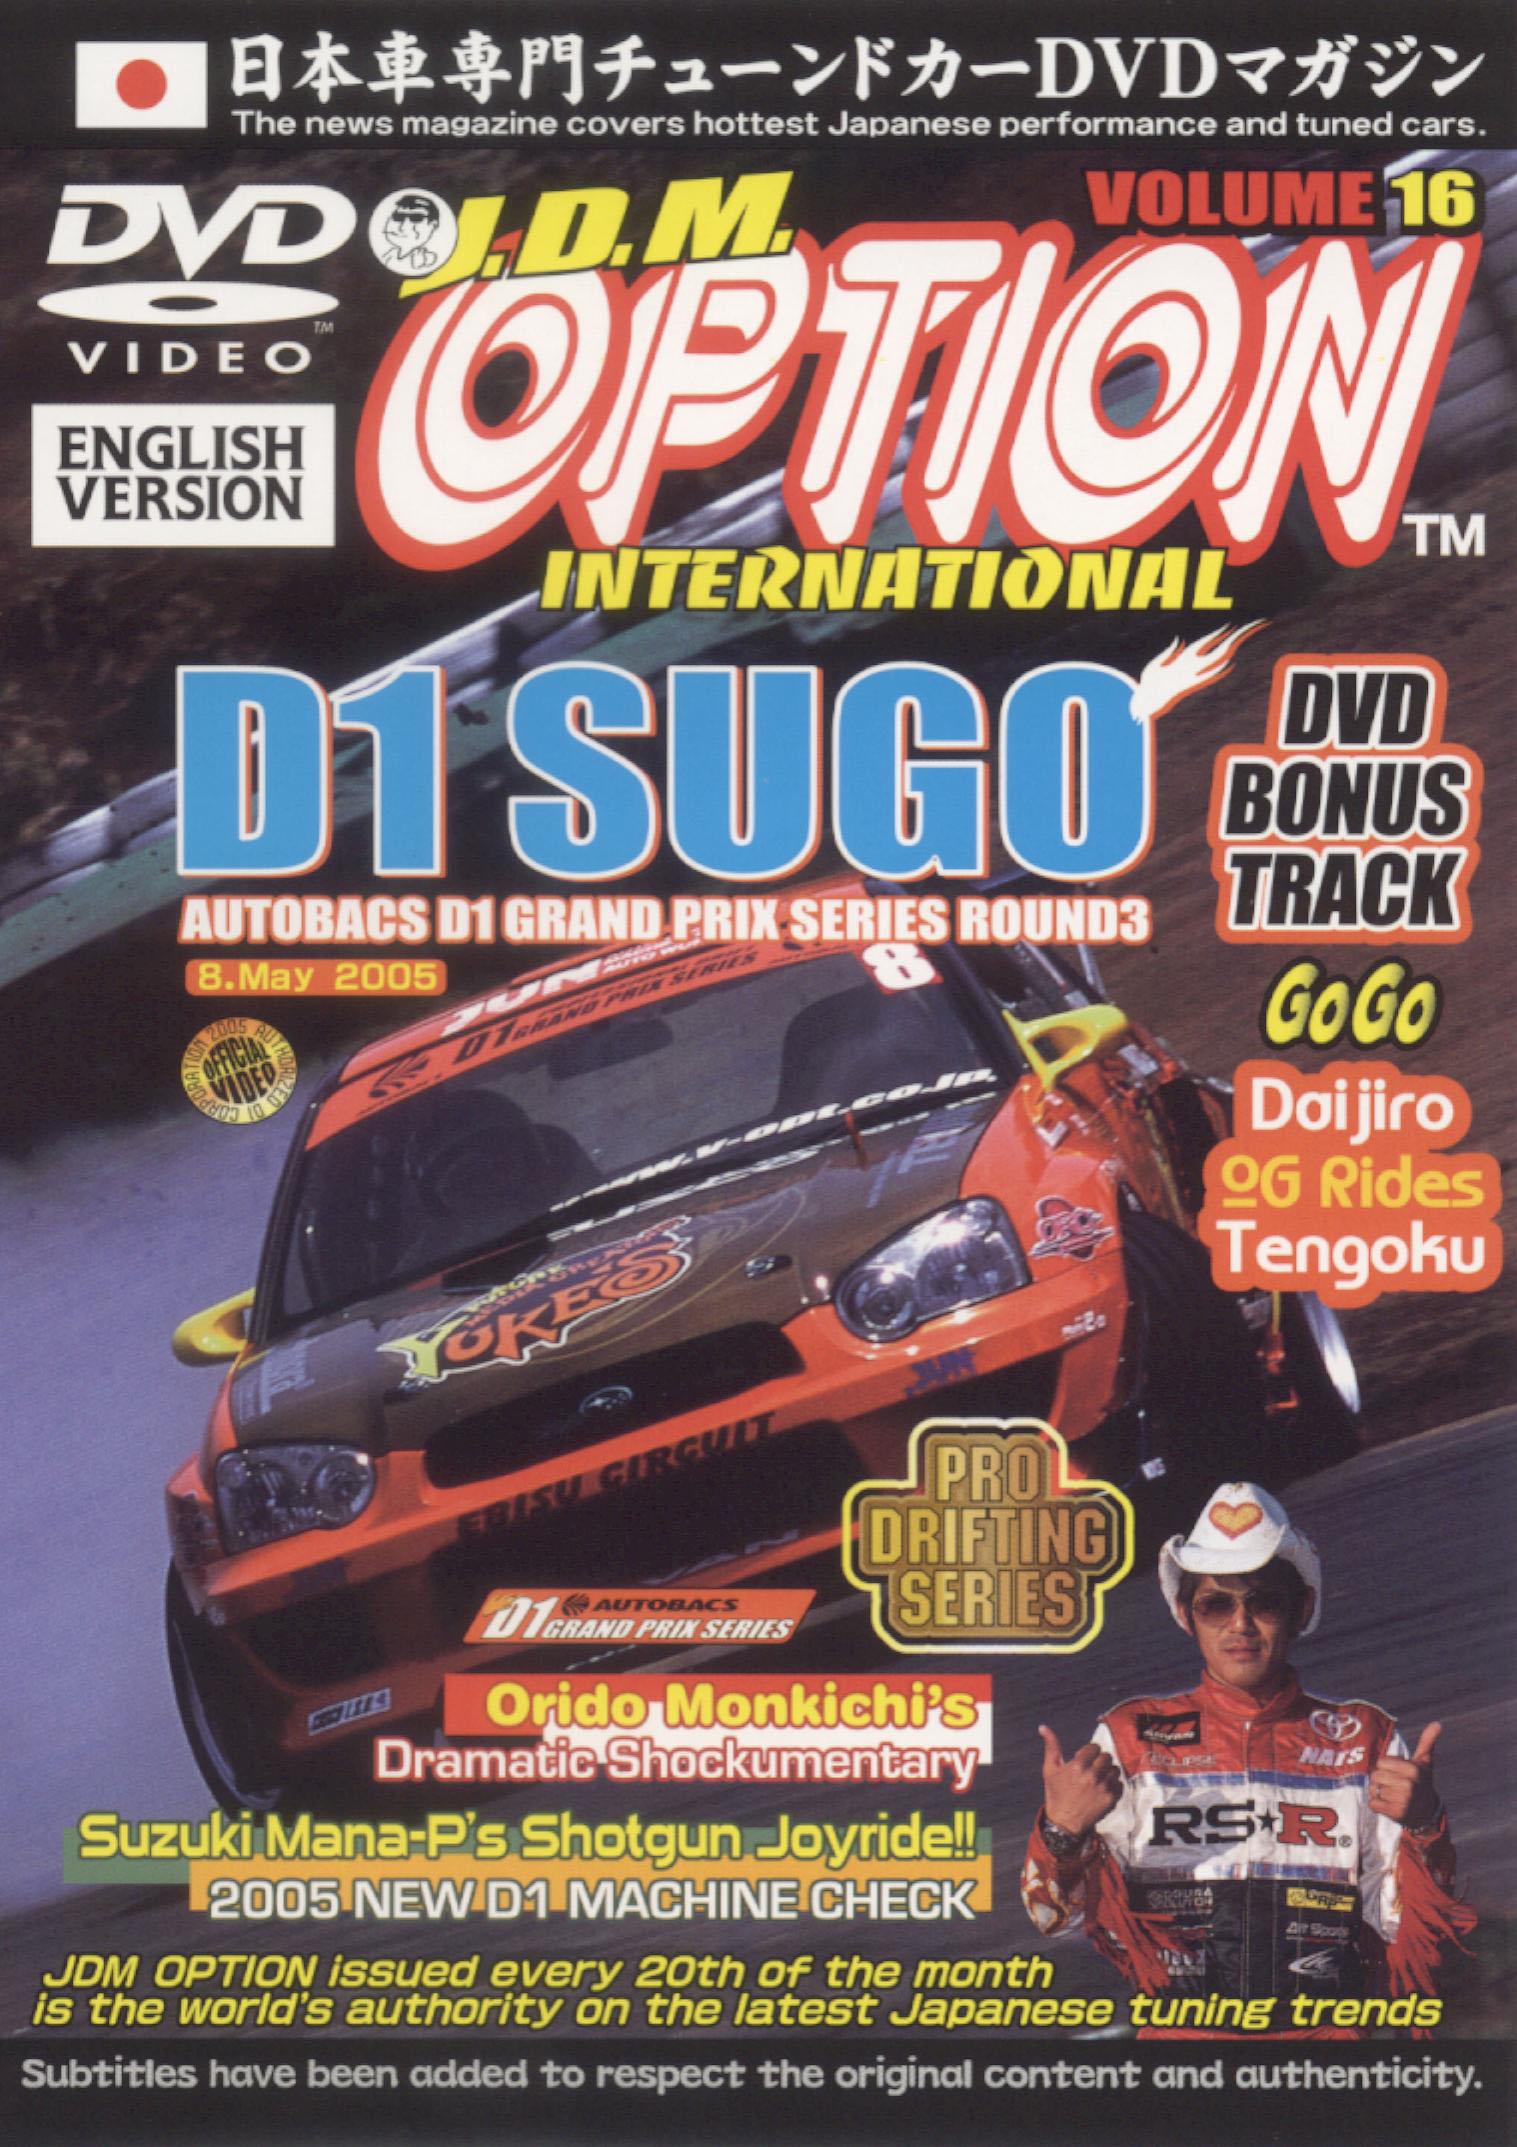 JDM Option, Vol. 16: 2005 D1 Grand Prix Sugo